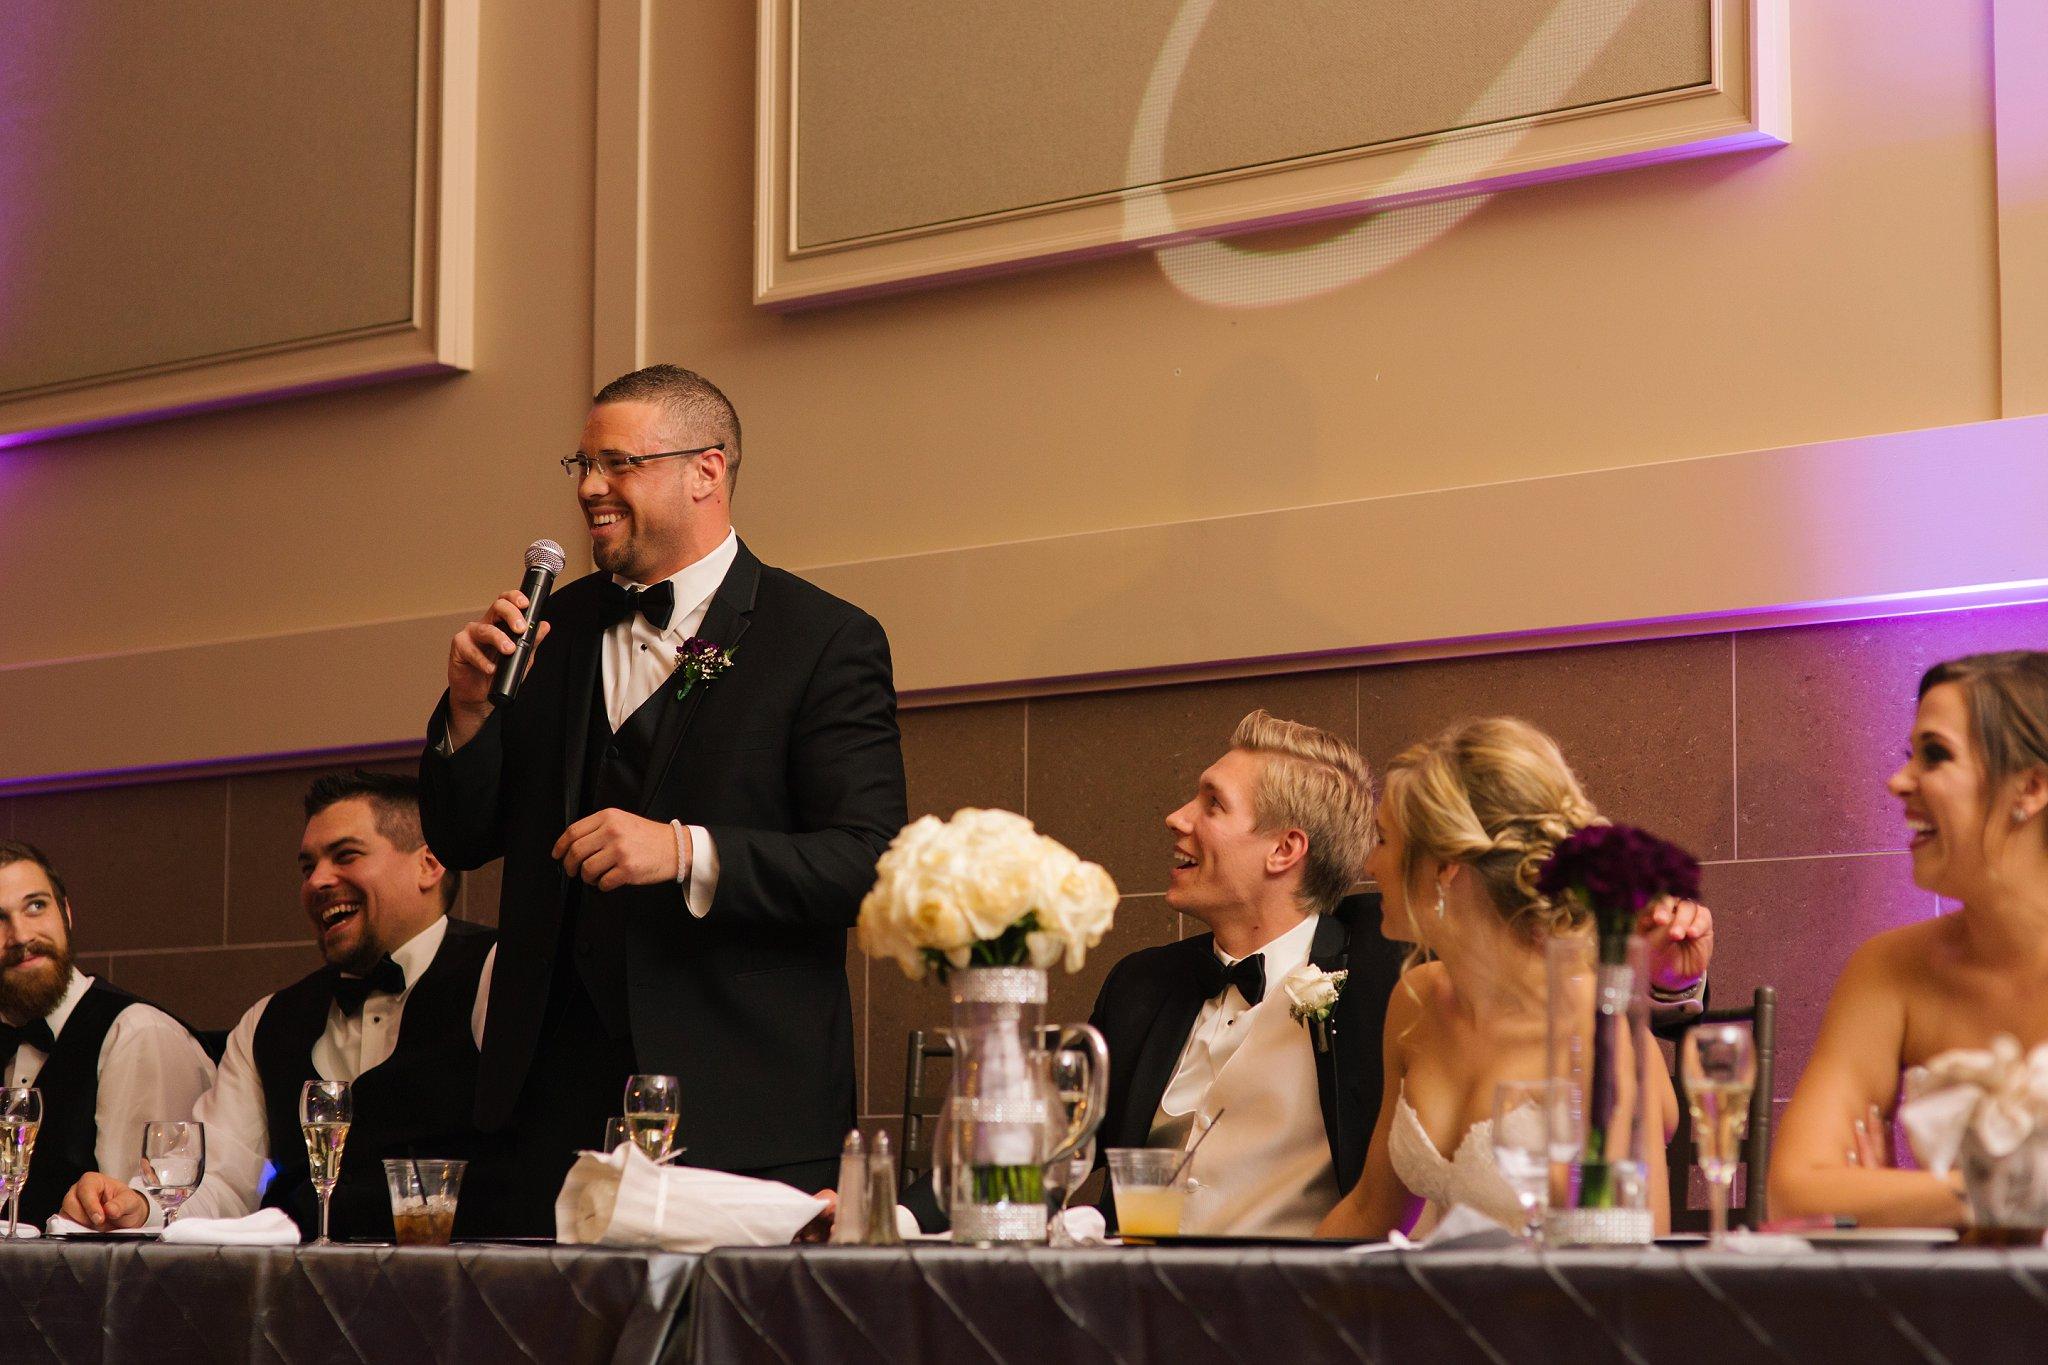 Chandler wedding at Noah's Event Center toasts